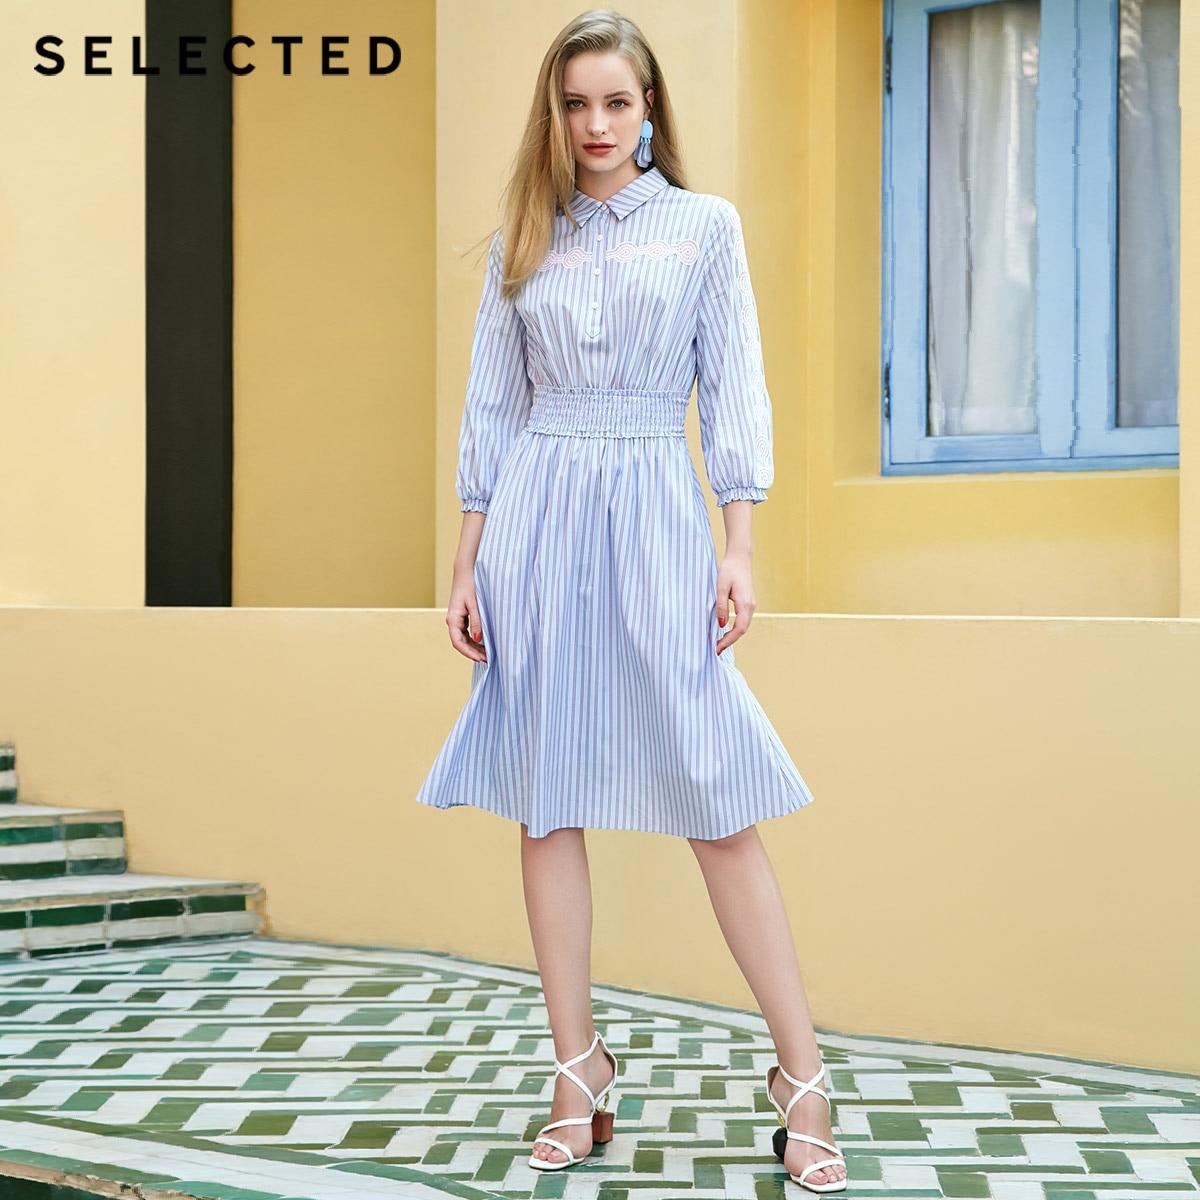 Selected 여름 약간의 스트레치 스트라이프 컷 아웃 드레스 s  41922j533-에서드레스부터 여성 의류 의  그룹 1